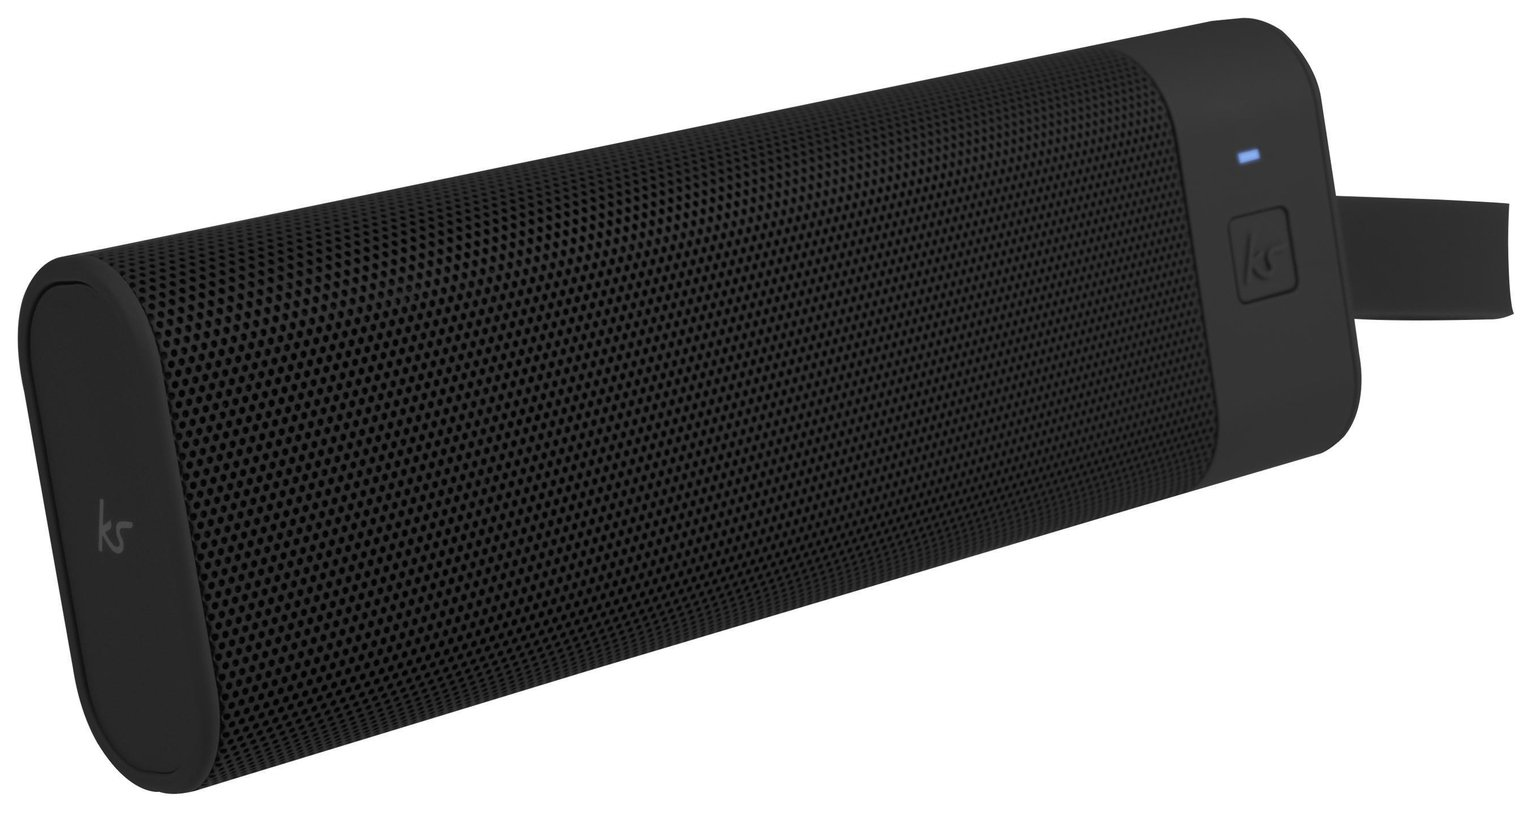 KitSound Boombar Portable Wireless Speaker - Black